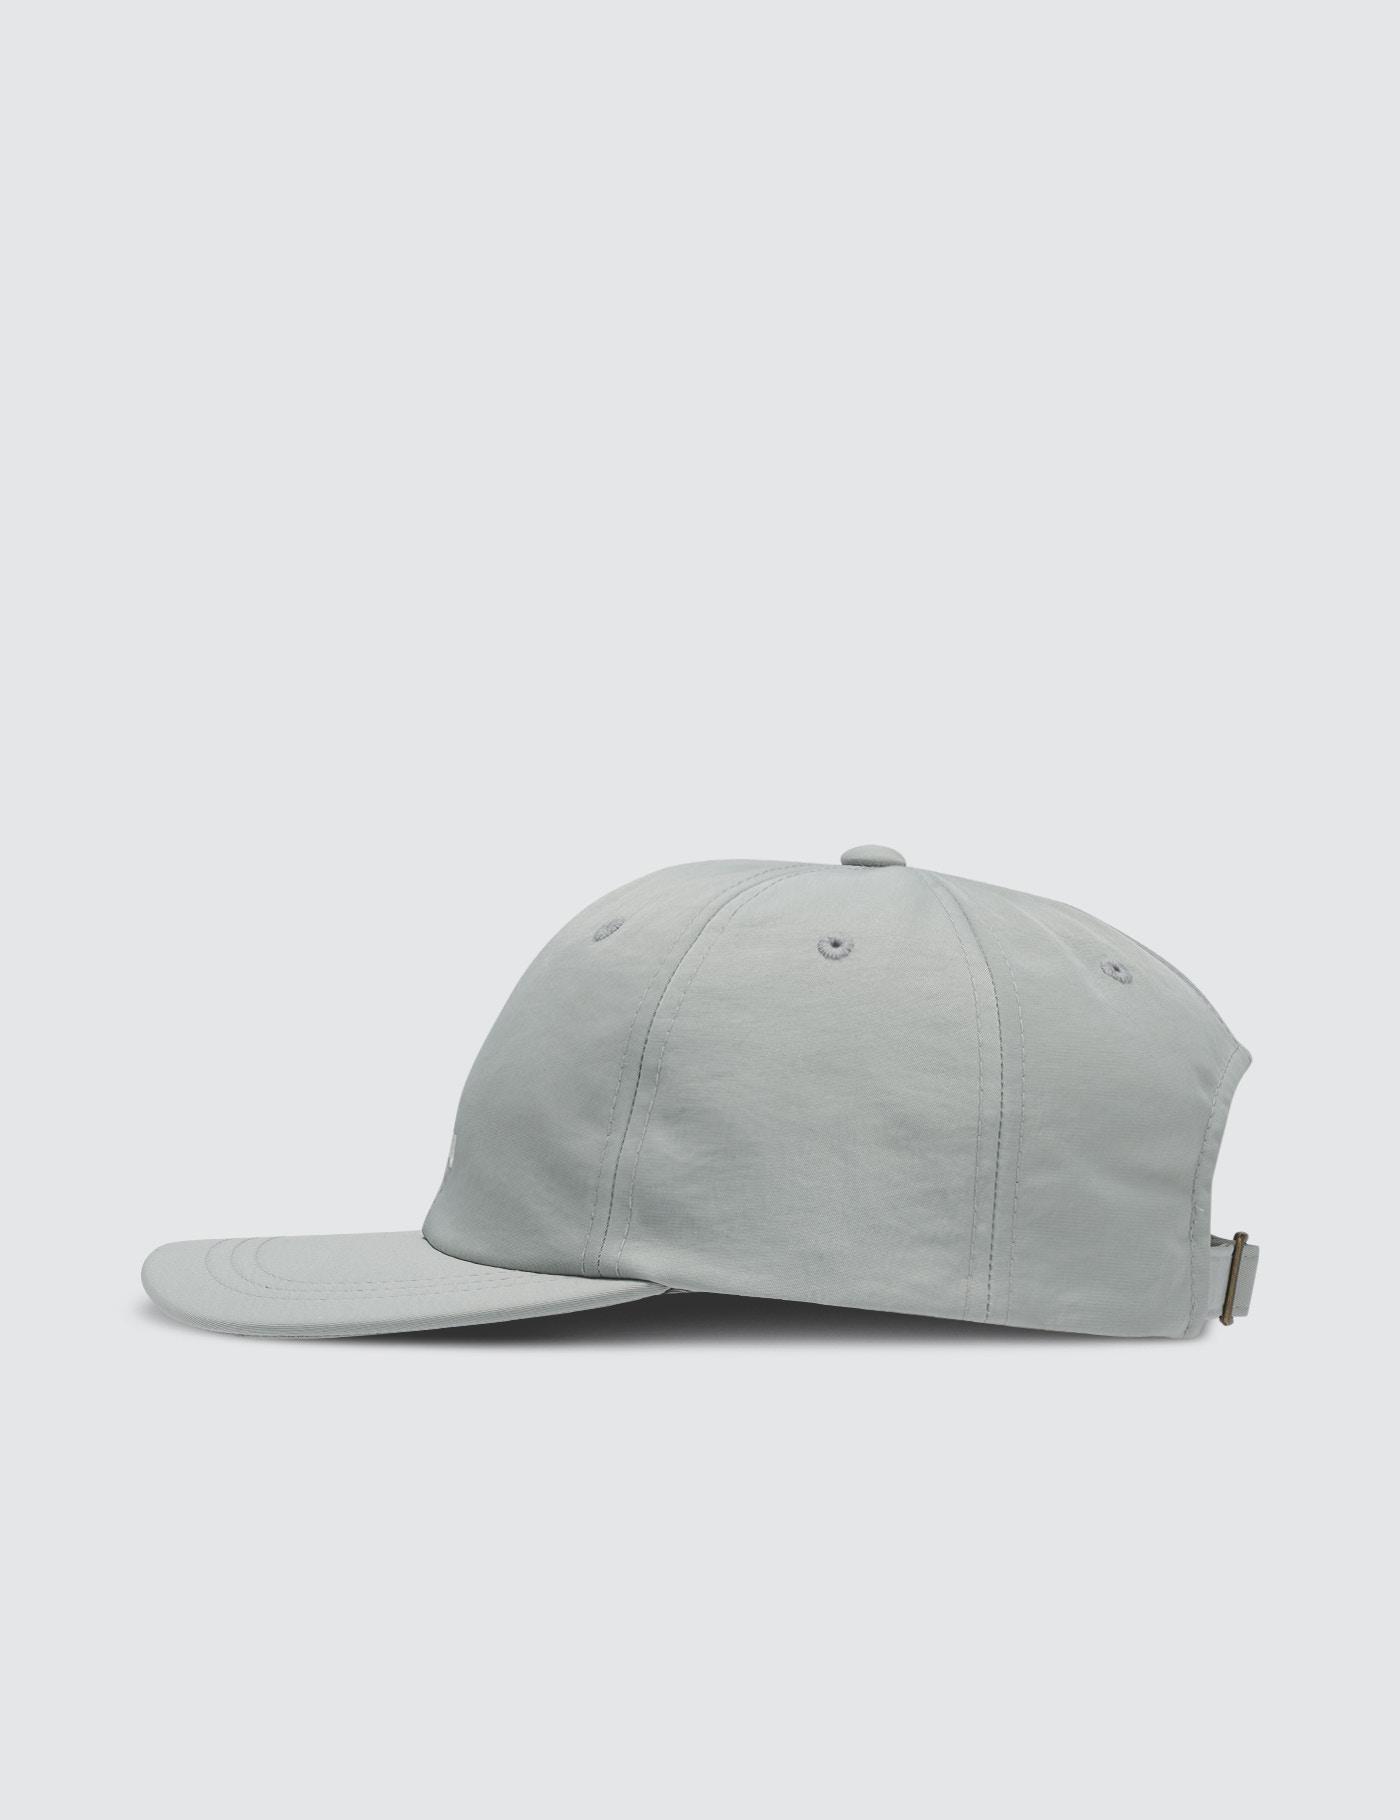 5612e8cc79b Lyst - Stussy Helvetica Nylon Low Pro Cap in Gray for Men